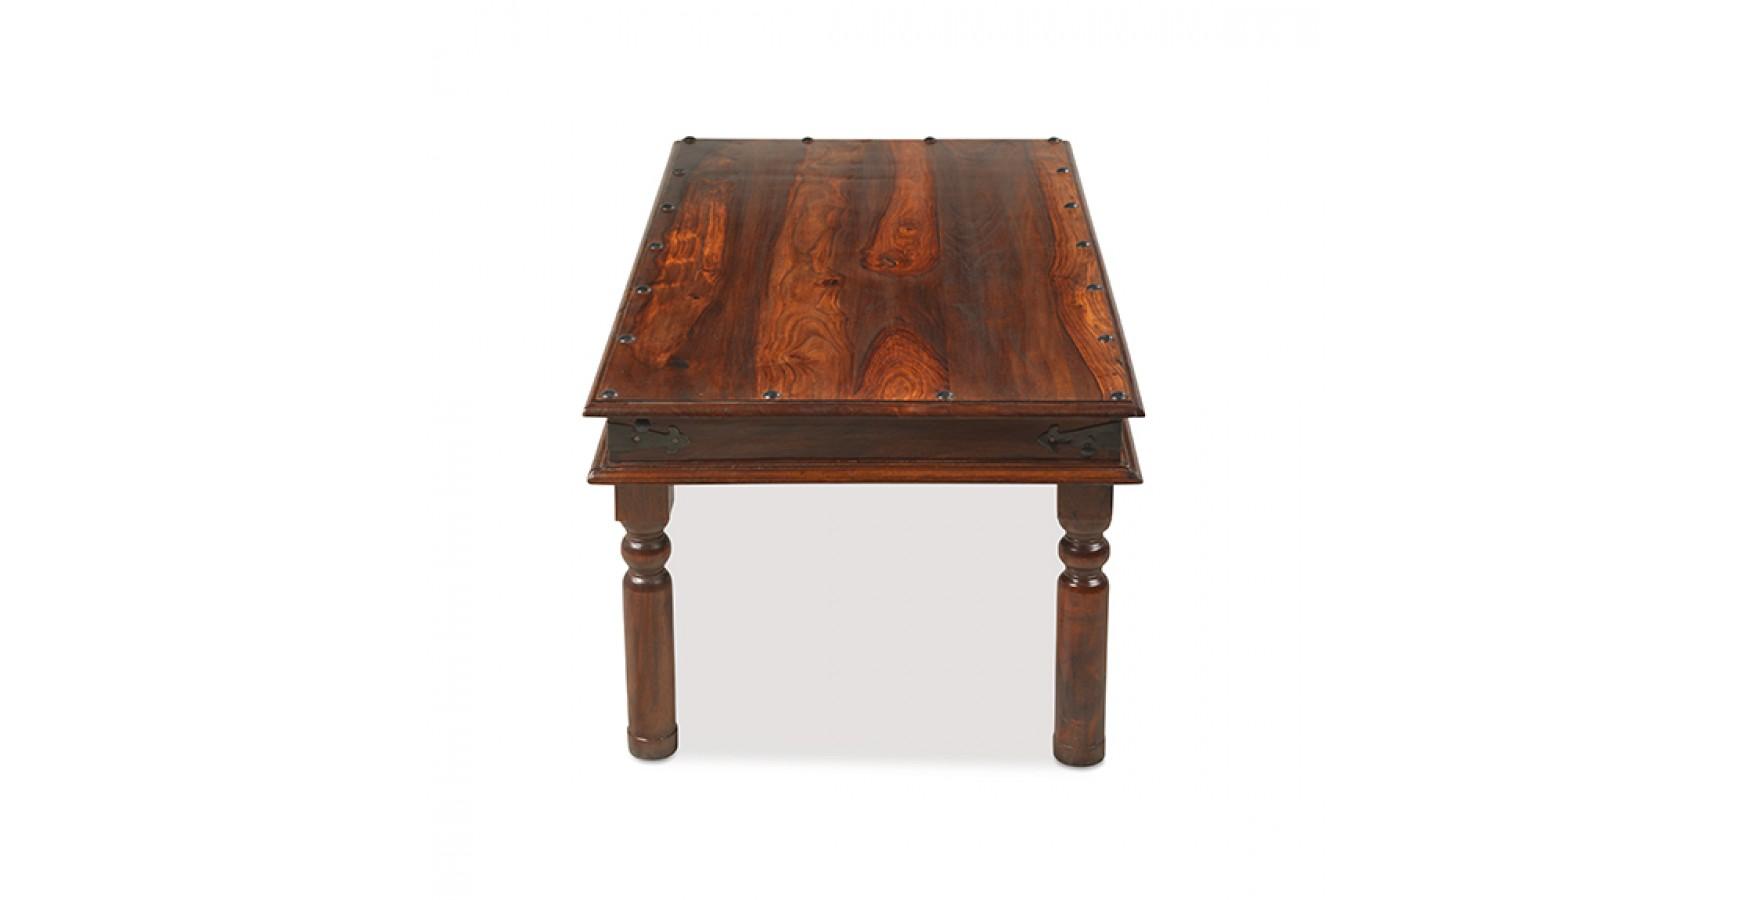 Jali Sheesham 110 cm Thakat Coffee Table Lifestyle Furniture UK